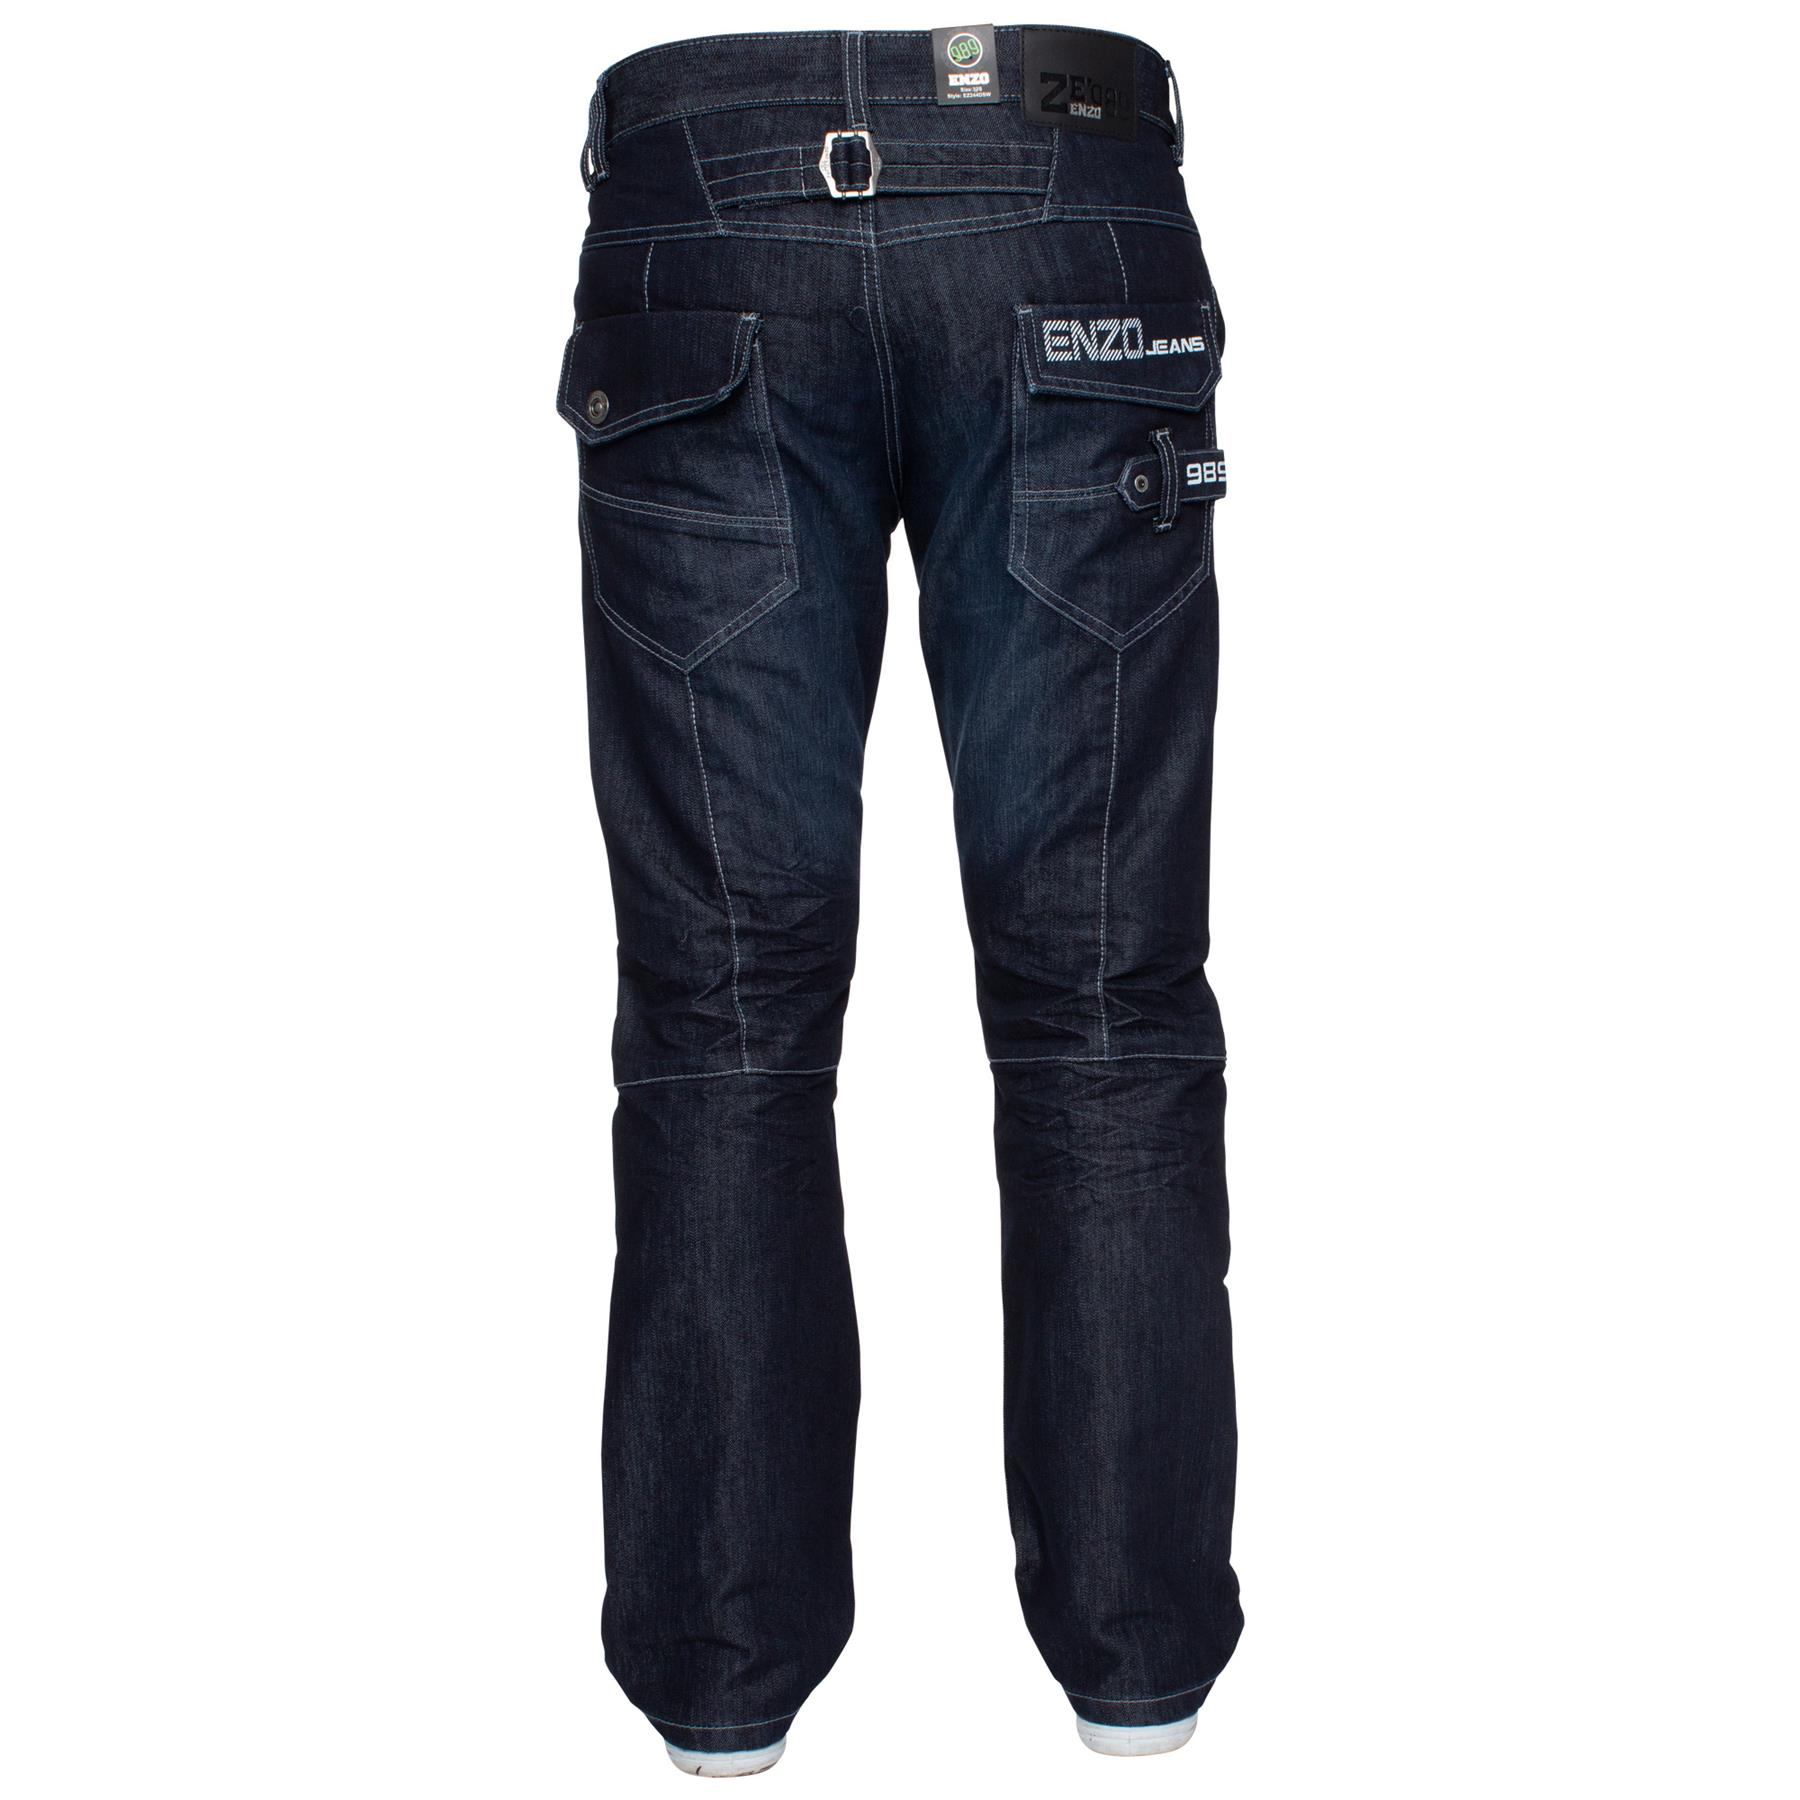 ENZO-Jeans-para-hombre-Big-Alto-Pierna-King-Size-Jeans-Pantalones-Chino-Pantalones-Pantalones-44-034 miniatura 69